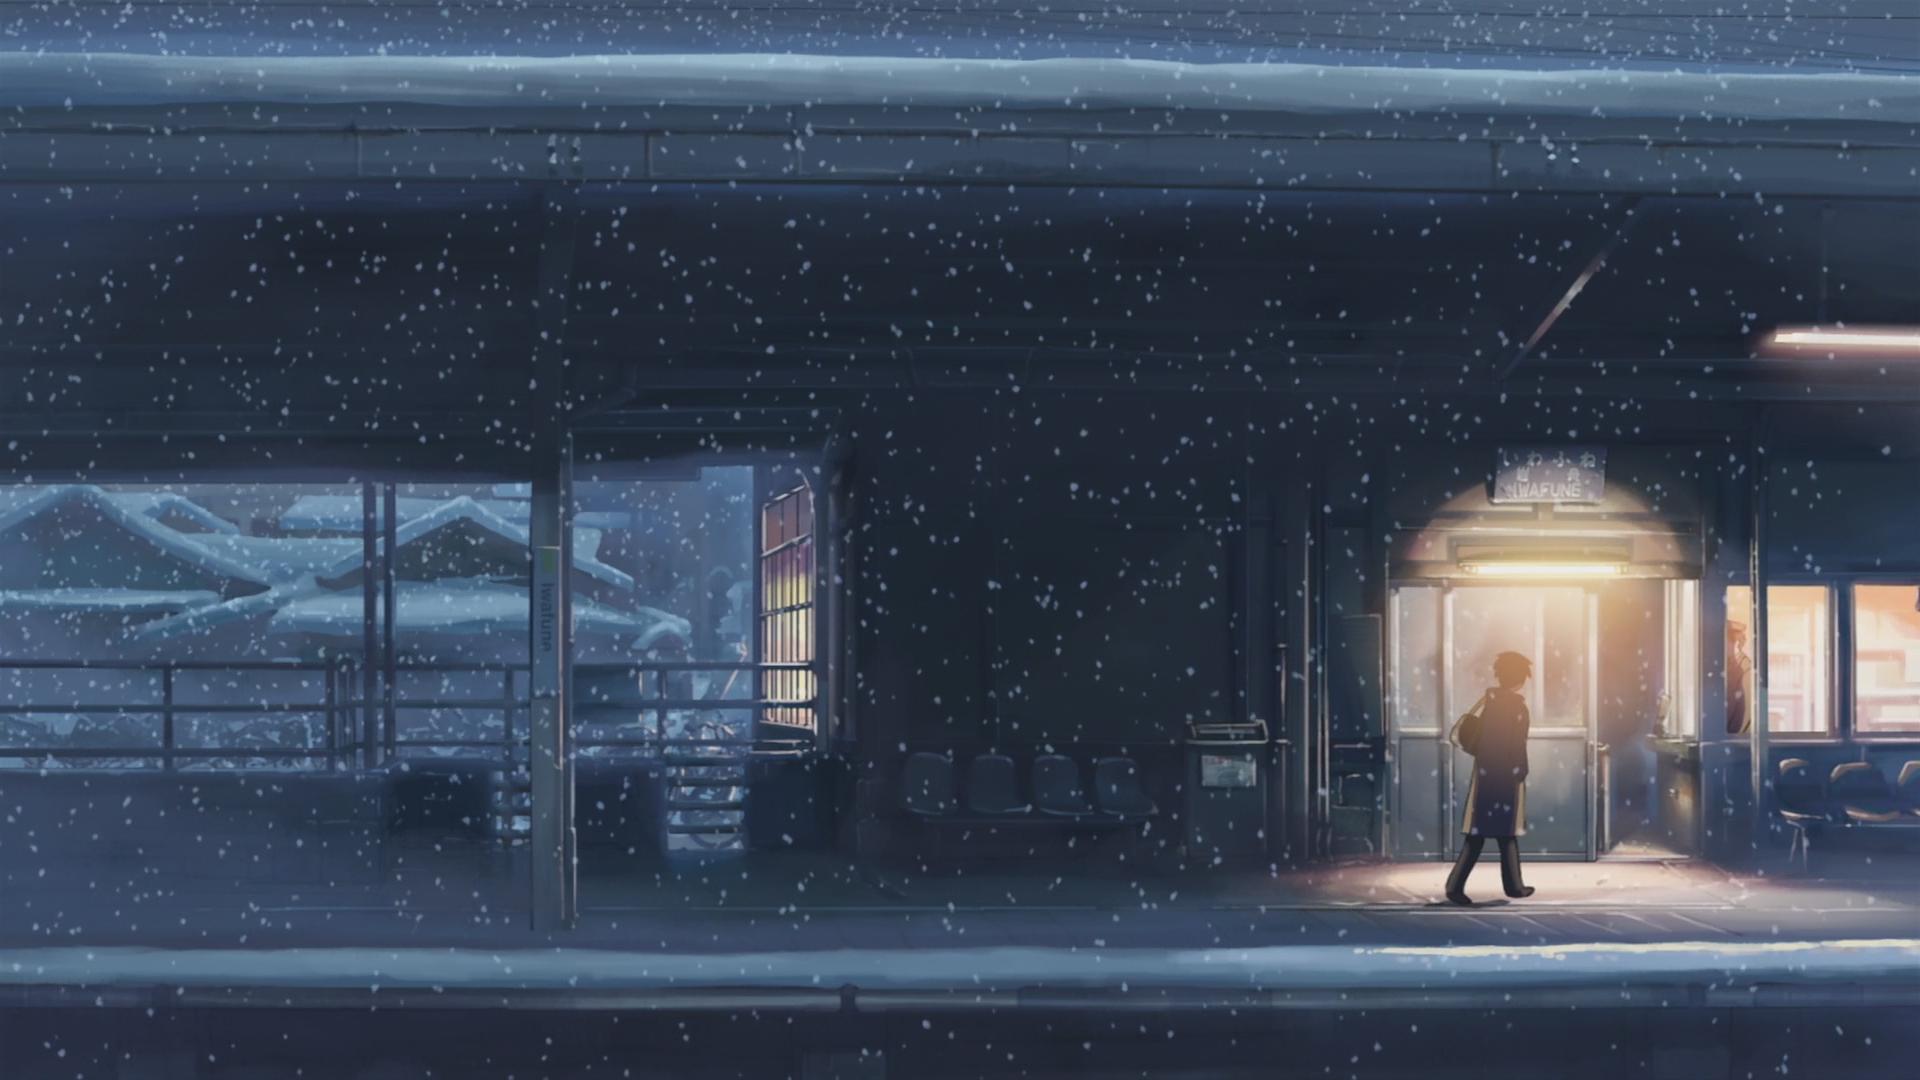 Anime 1920x1080 5 Centimeters Per Second Makoto Shinkai